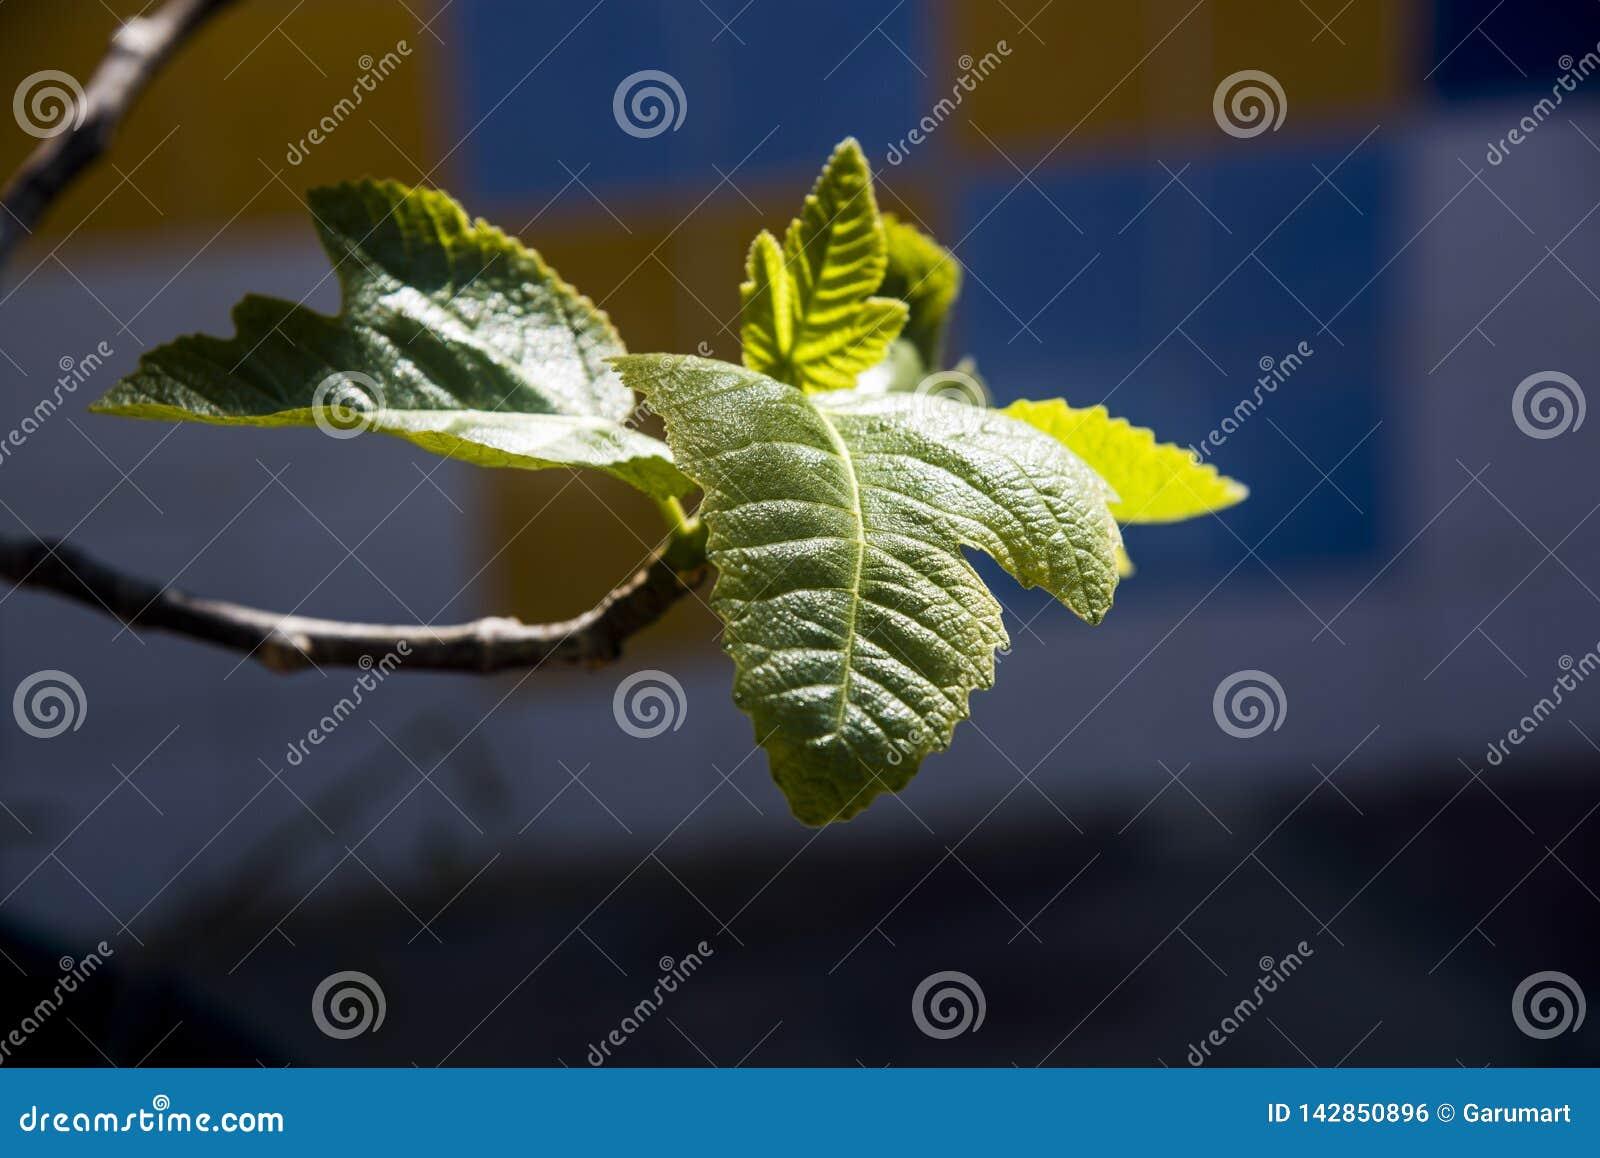 Neugeborene Feigenbaumblätter